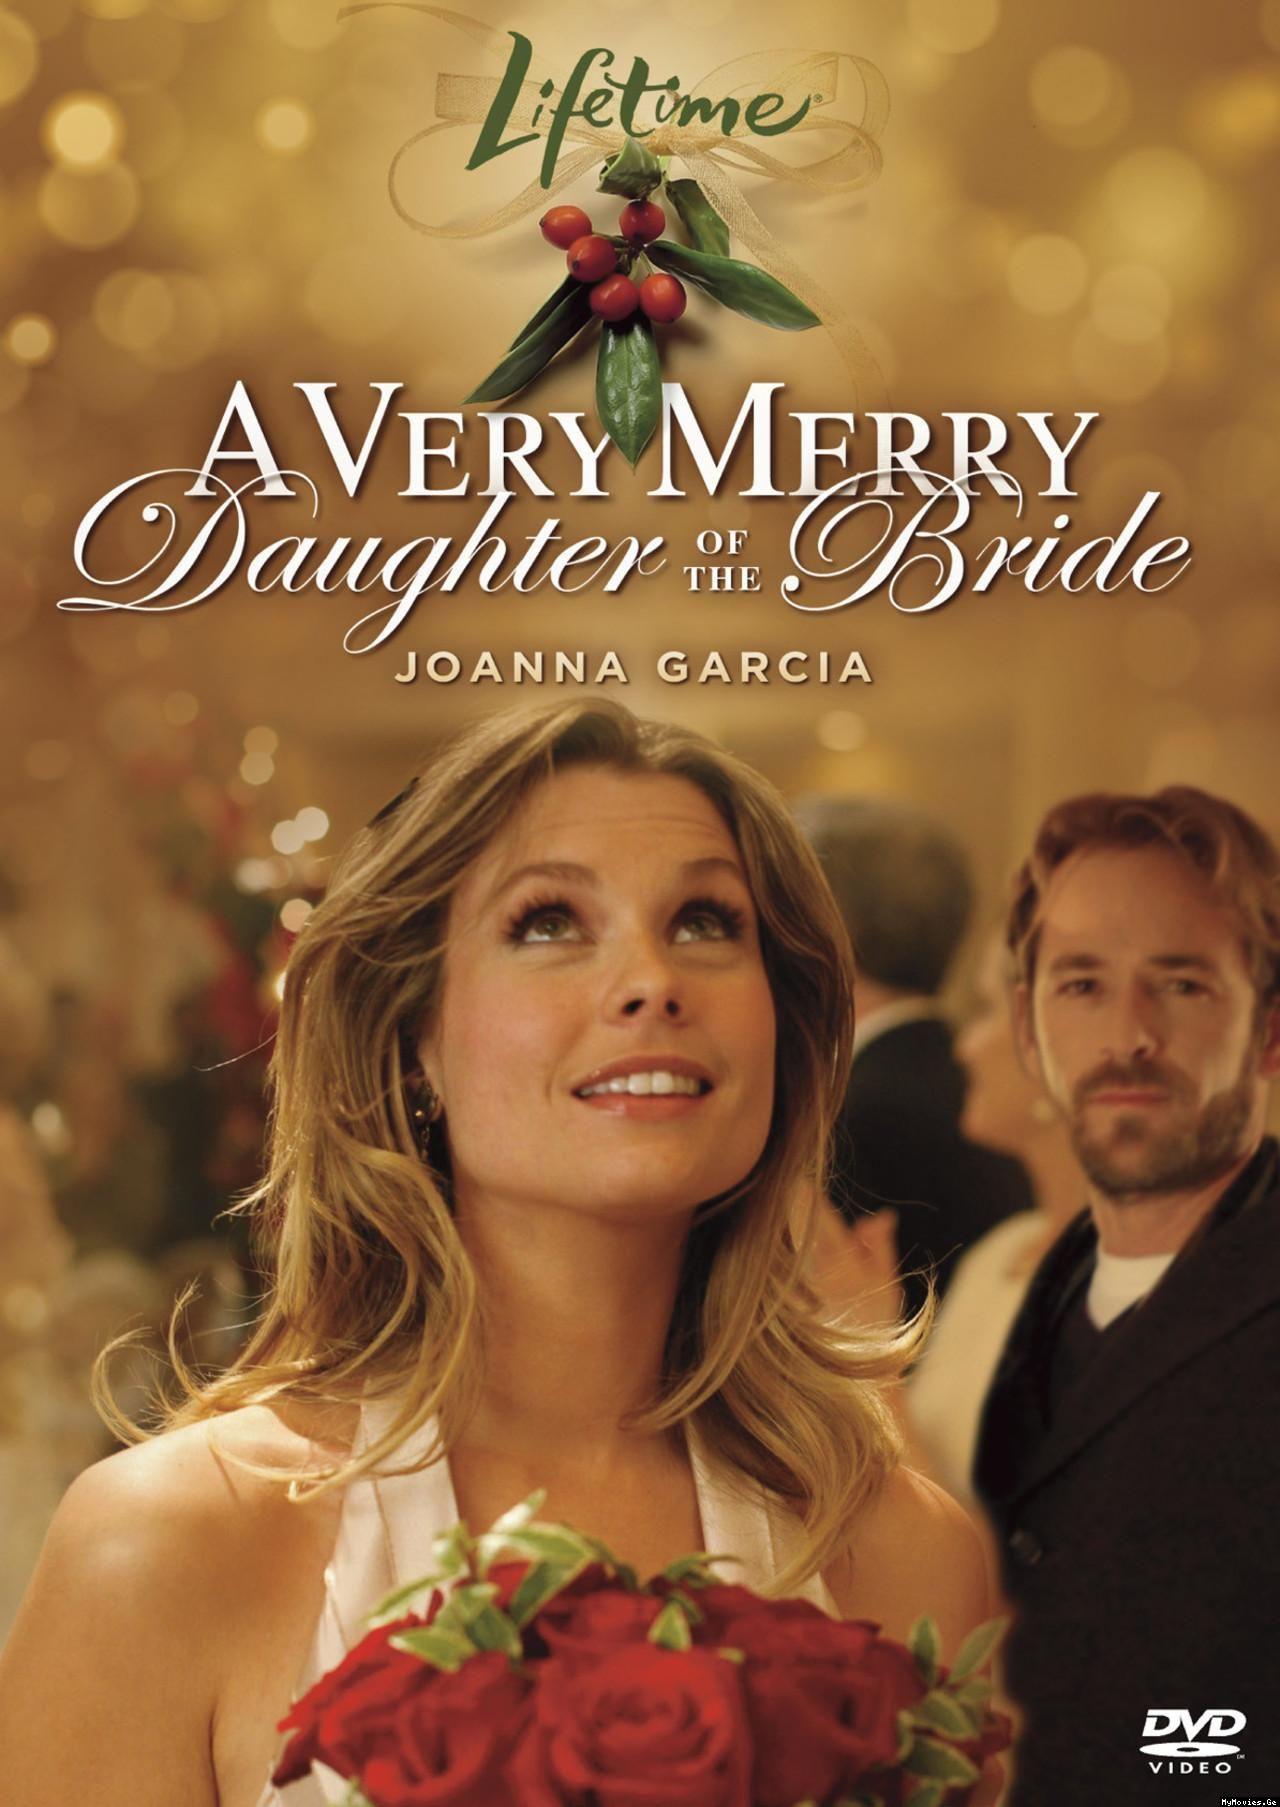 2013 Lifetime Movie. A wedding planner (Joanna Garcia